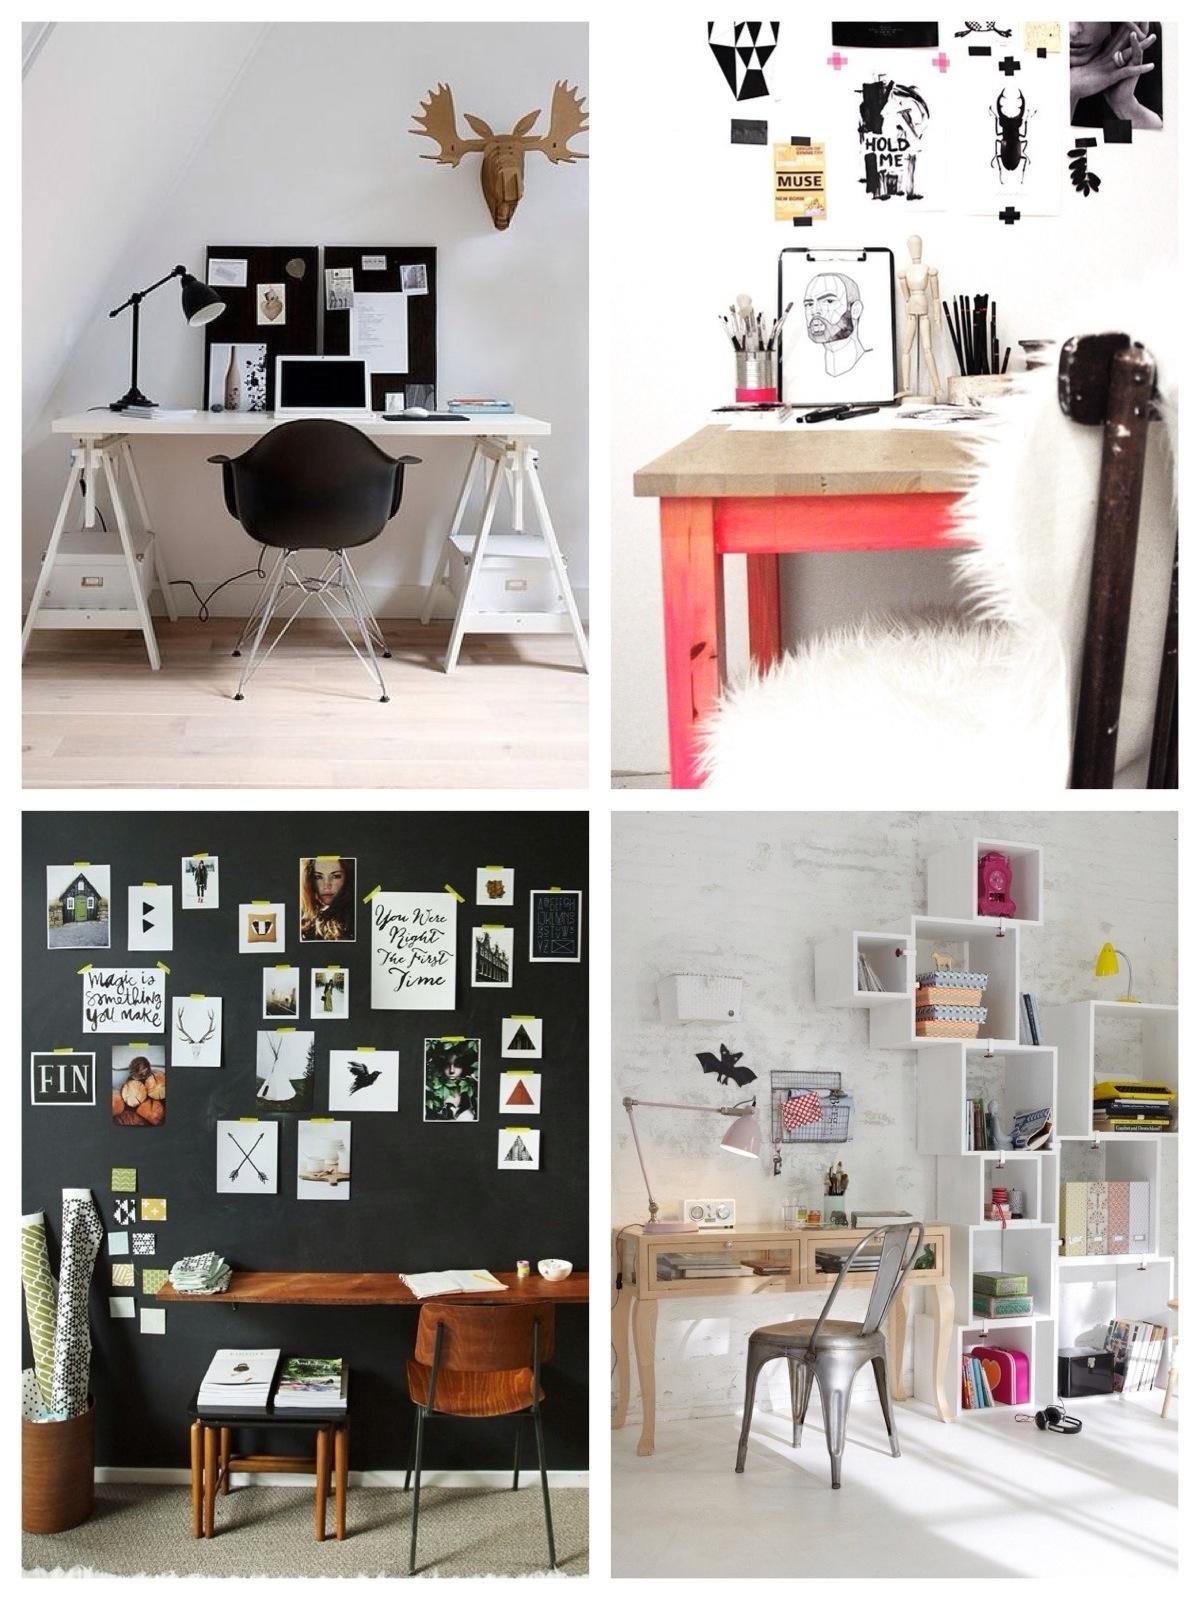 12 x inspiratie voor je werkkamer | Daily DecorDaily Decor: www.dailydecor.nl/2013/10/thuiskantoor